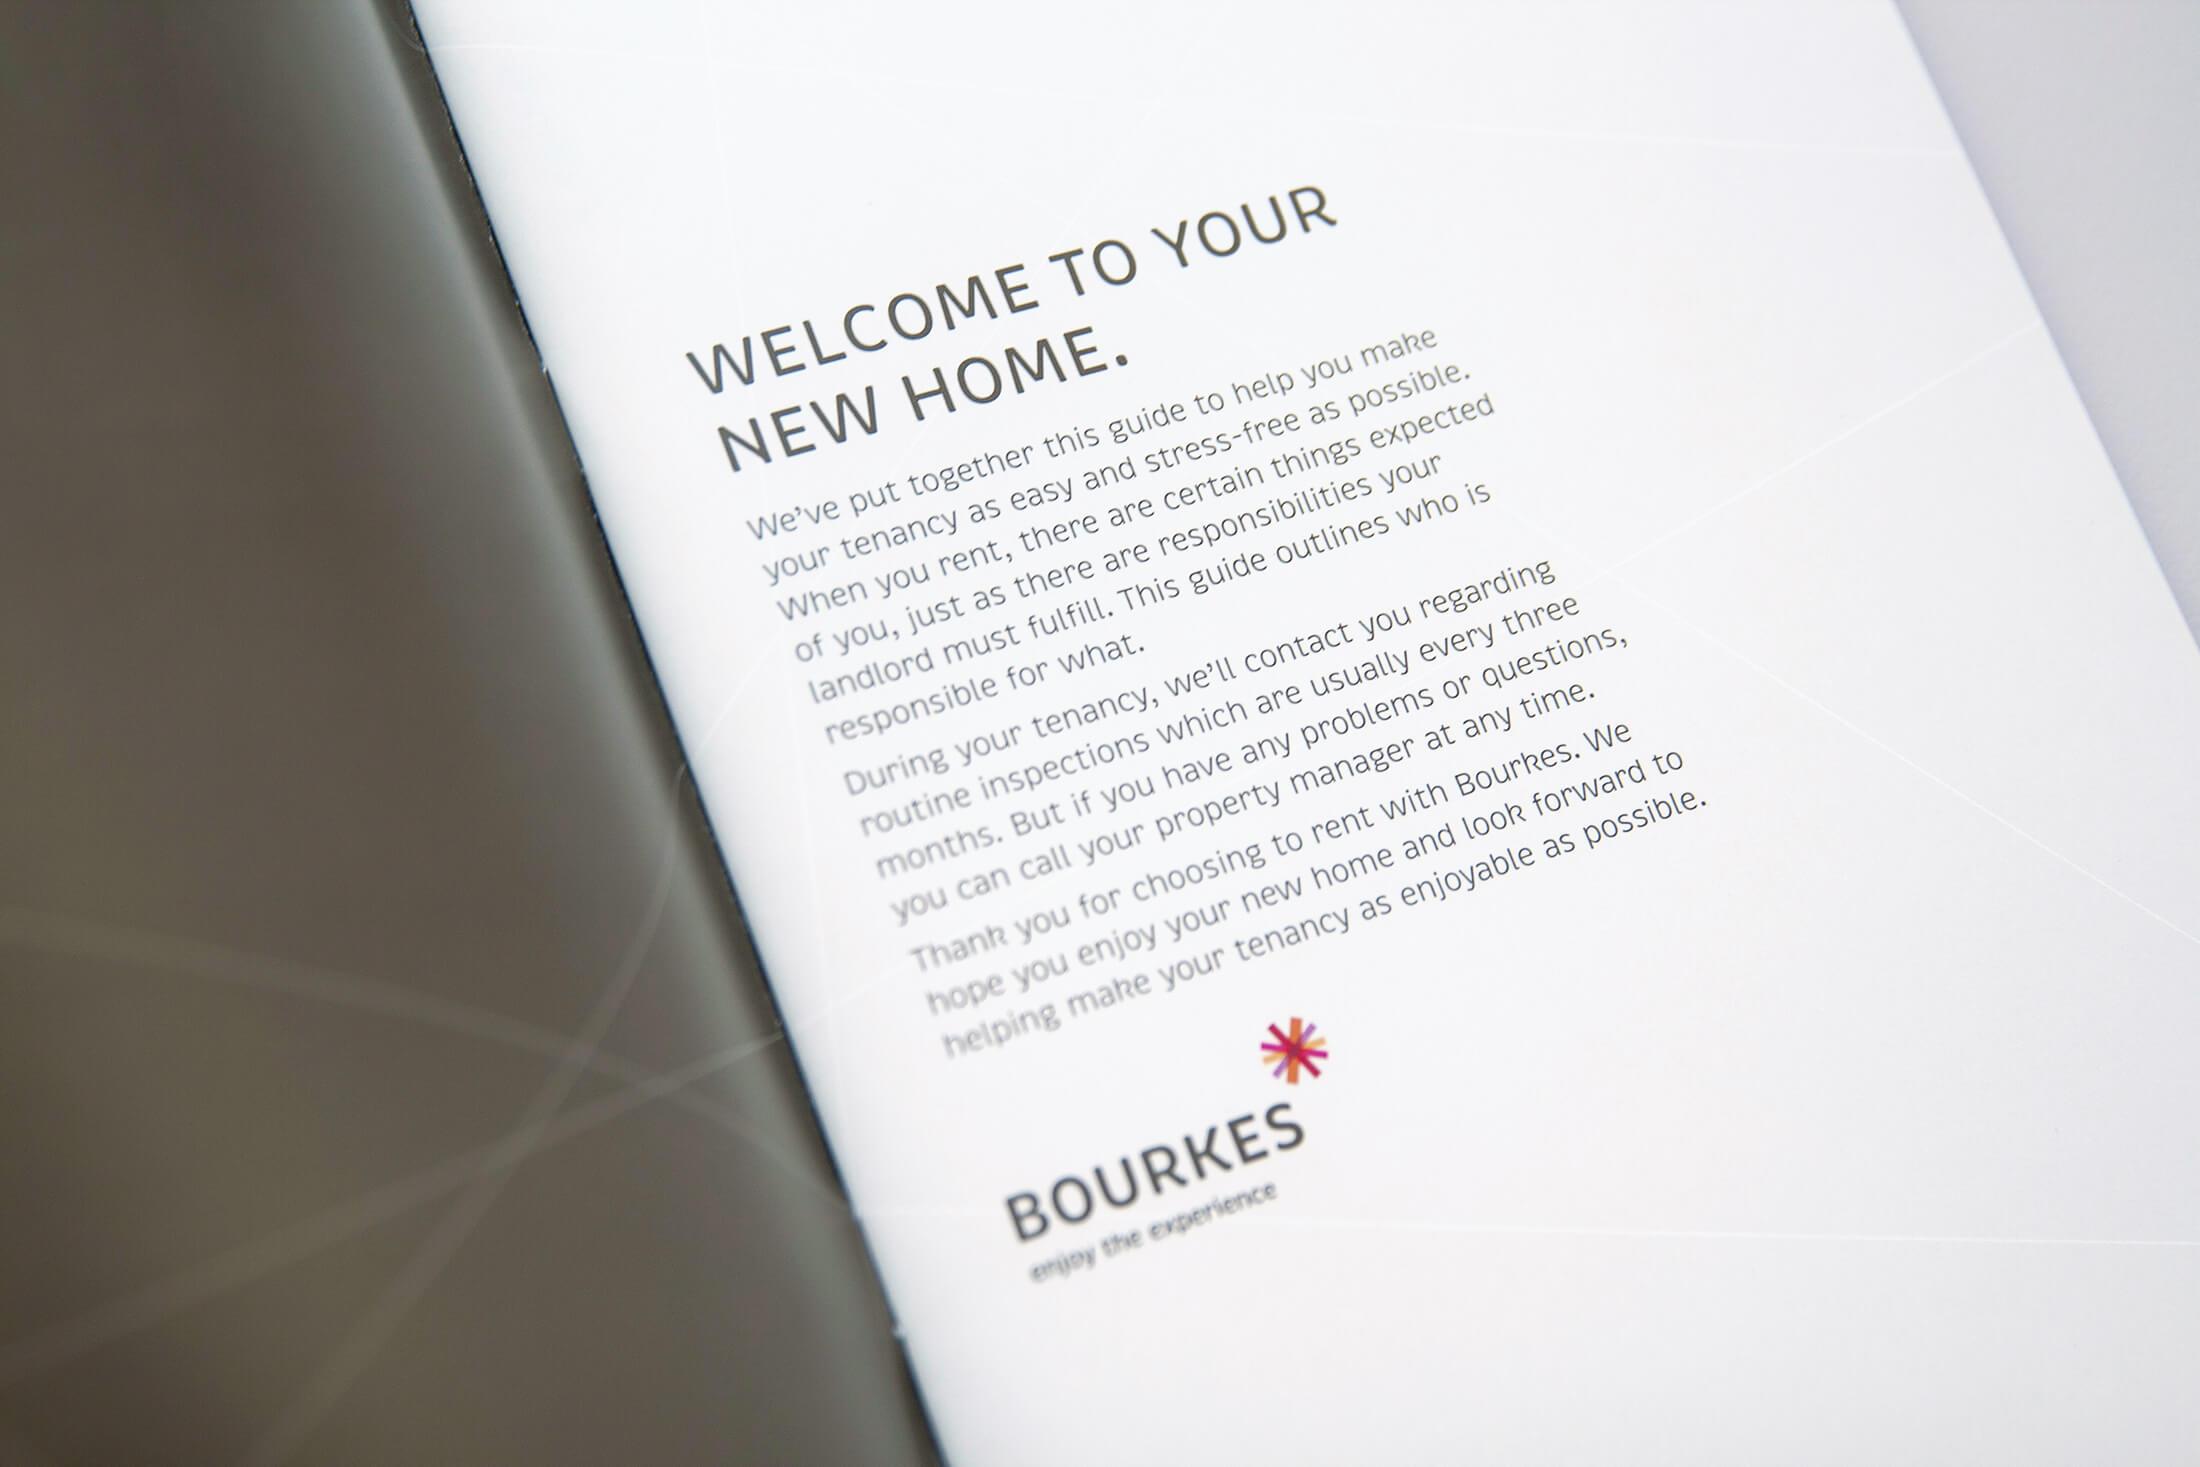 bourkes-realestate-brochure-design-inside2